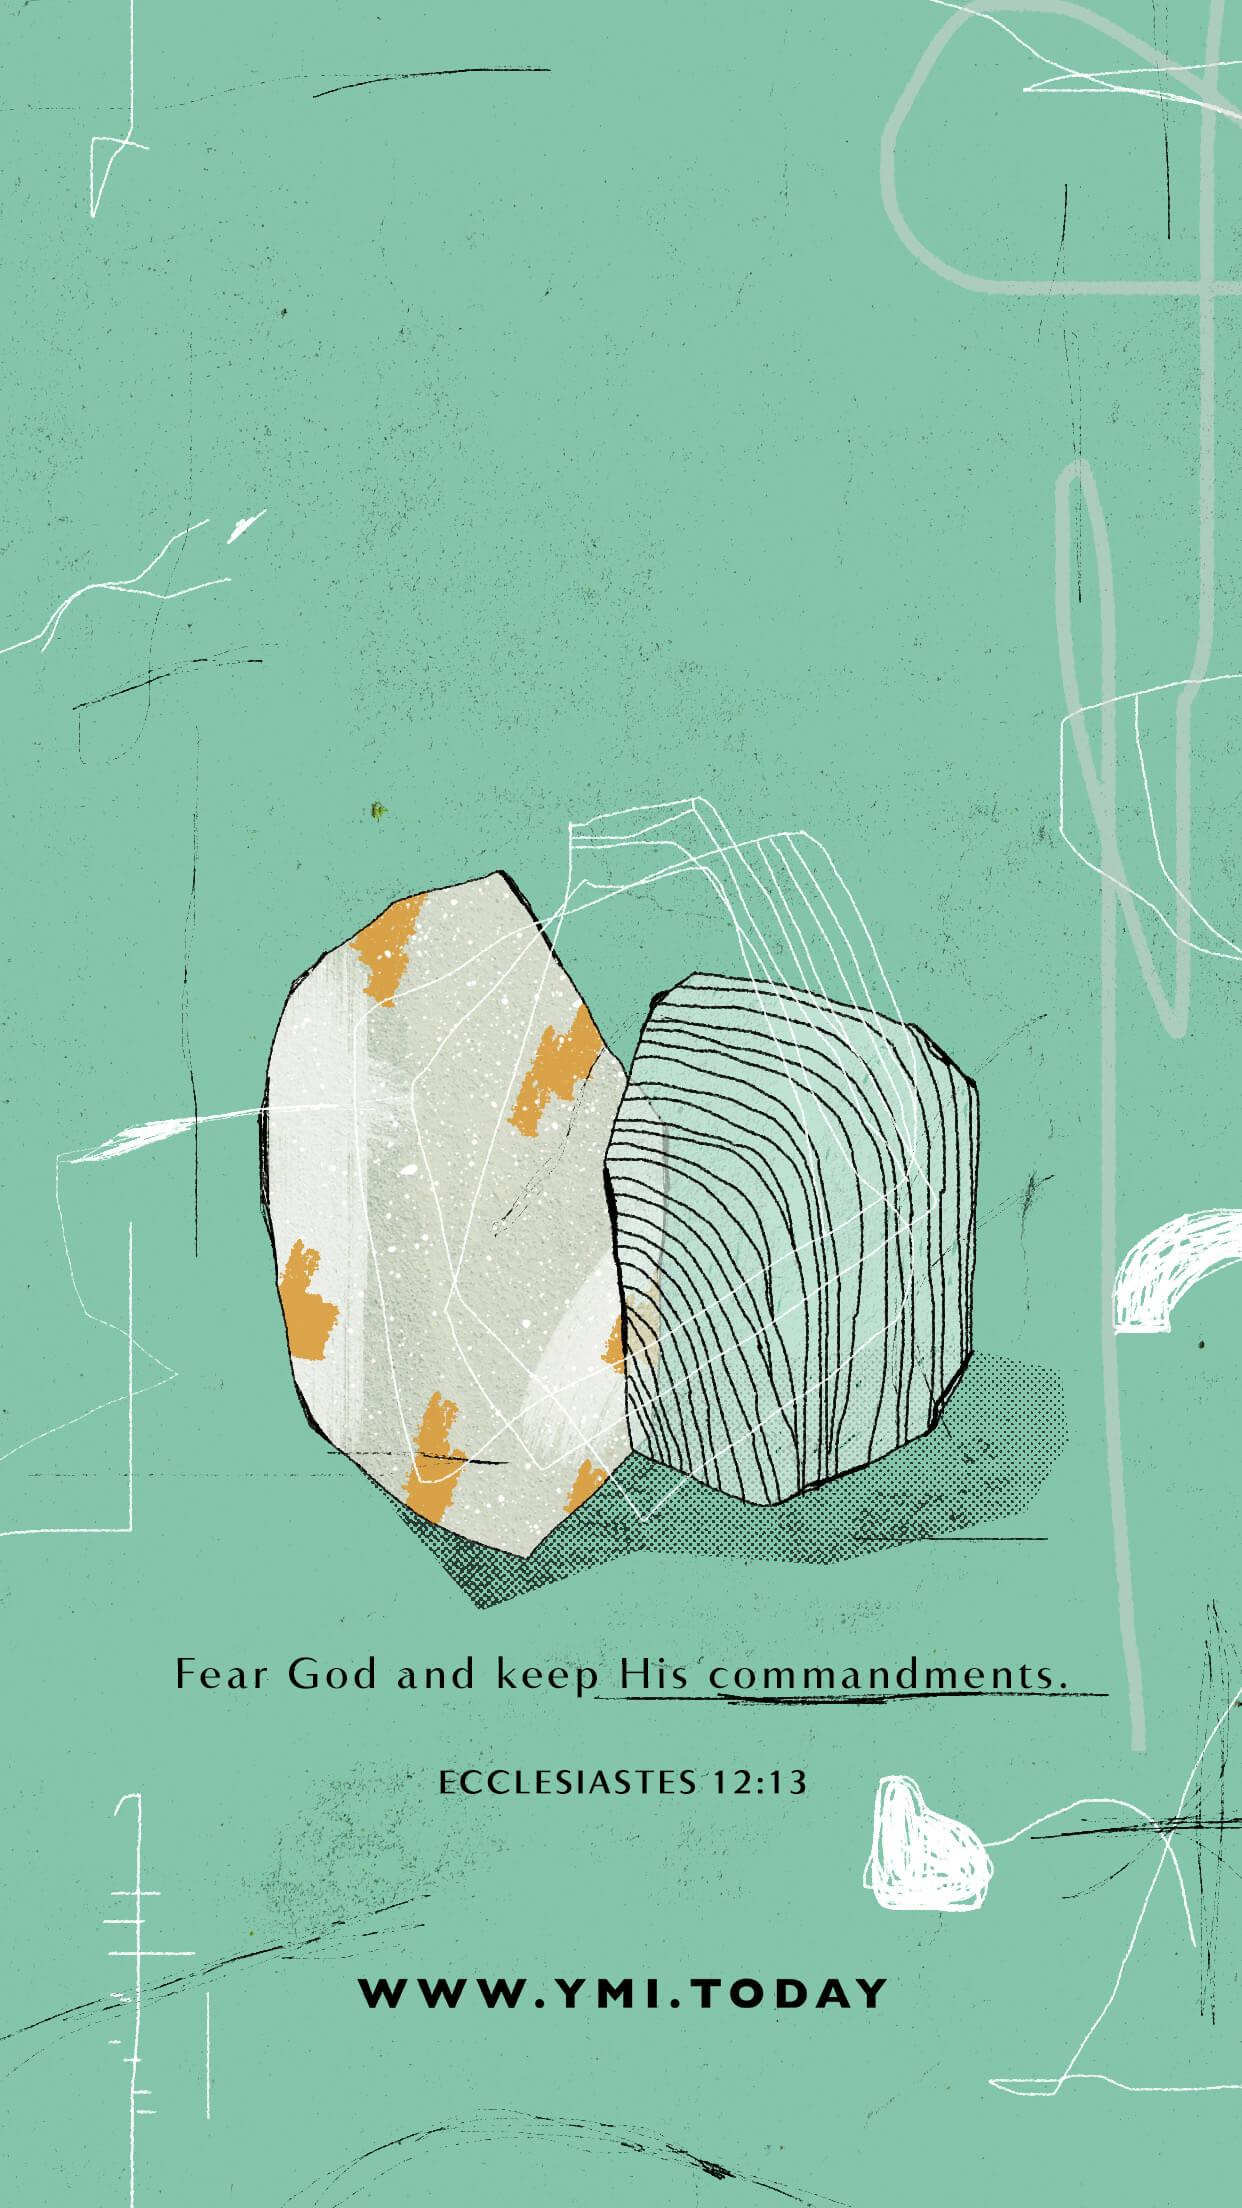 YMI Reading Ecclesiastes Phone Lockscreen - Fear God and keep His commandments. - Ecclesiastes 12:13